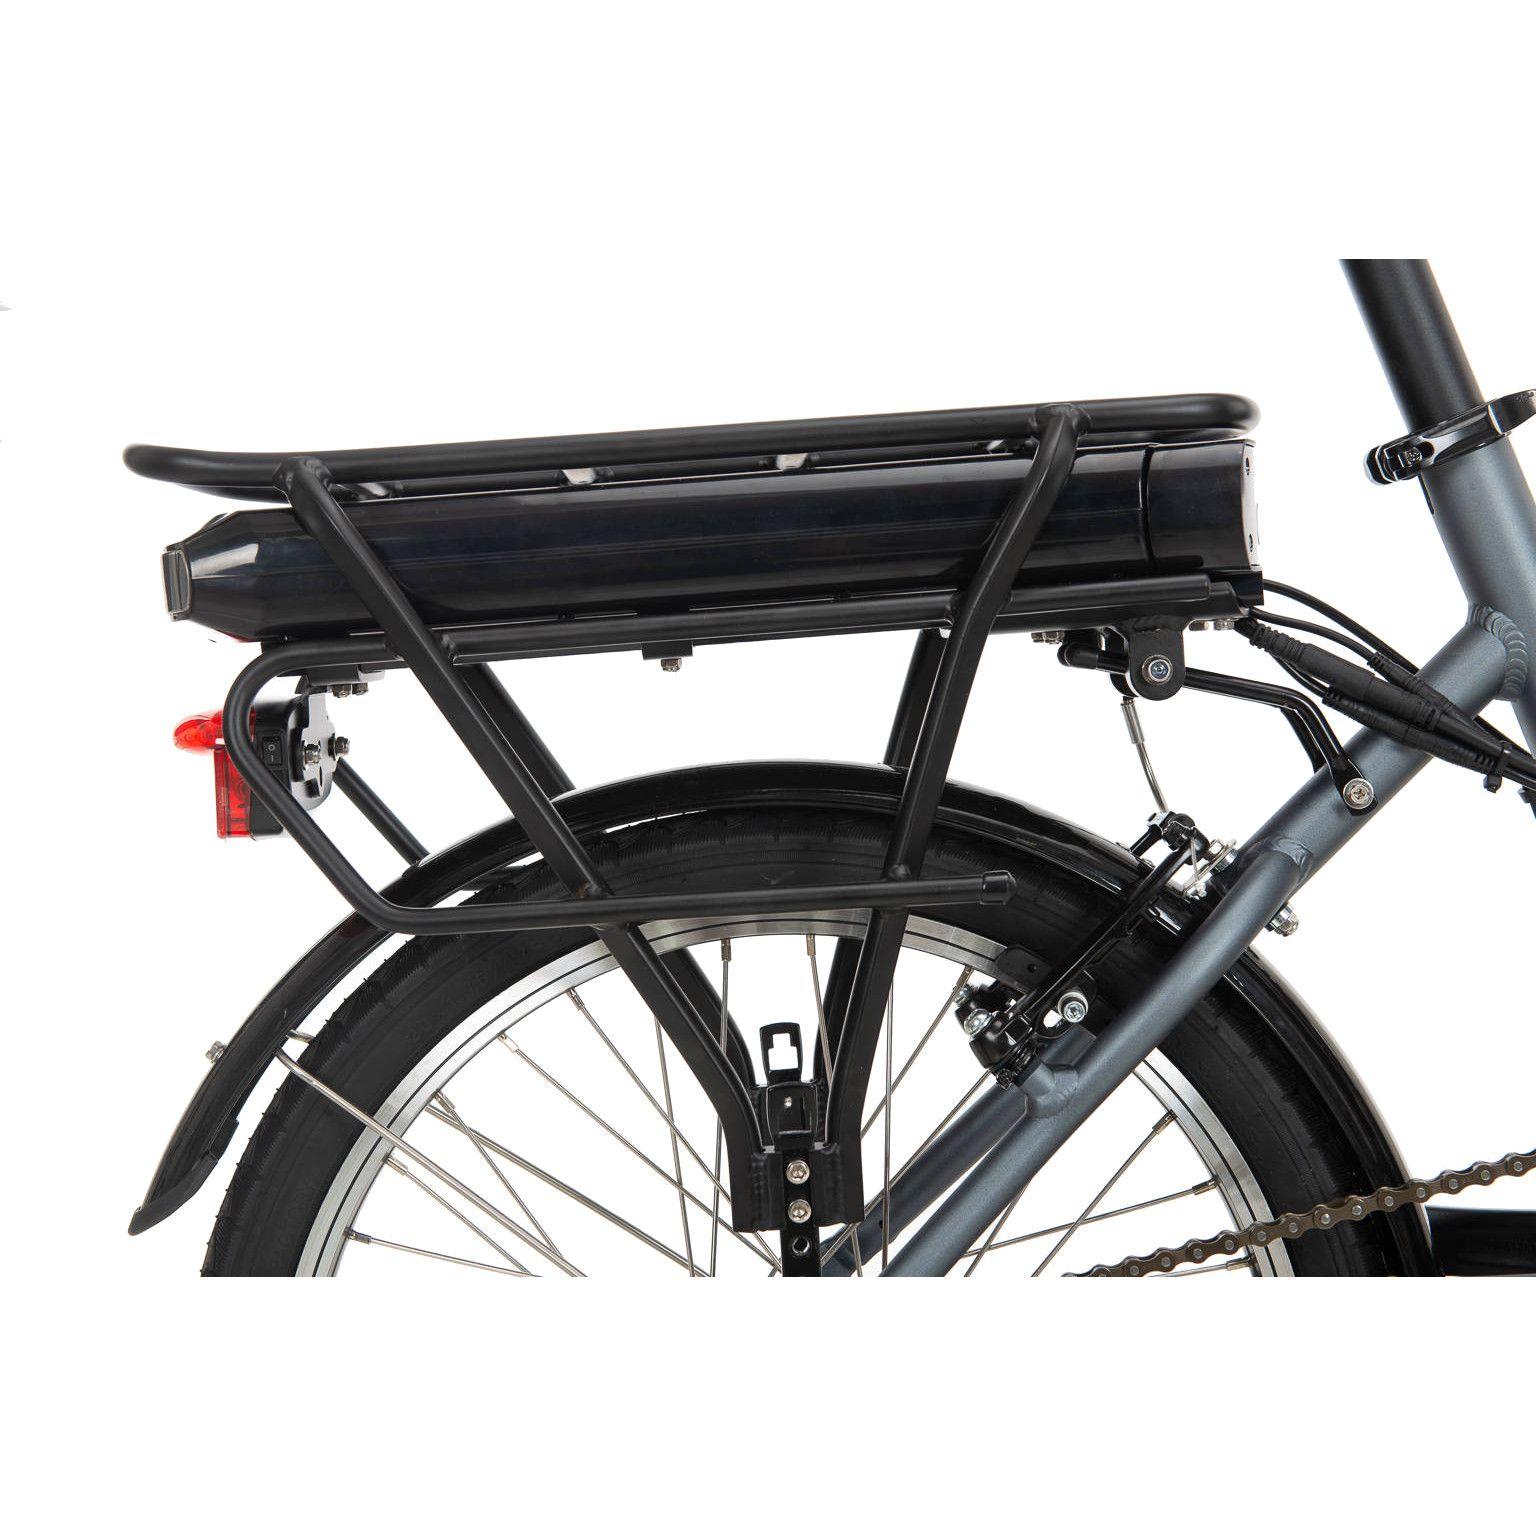 Bicicleta Elétrica Urbana Sense Easy E-Urban Dobrável 2020